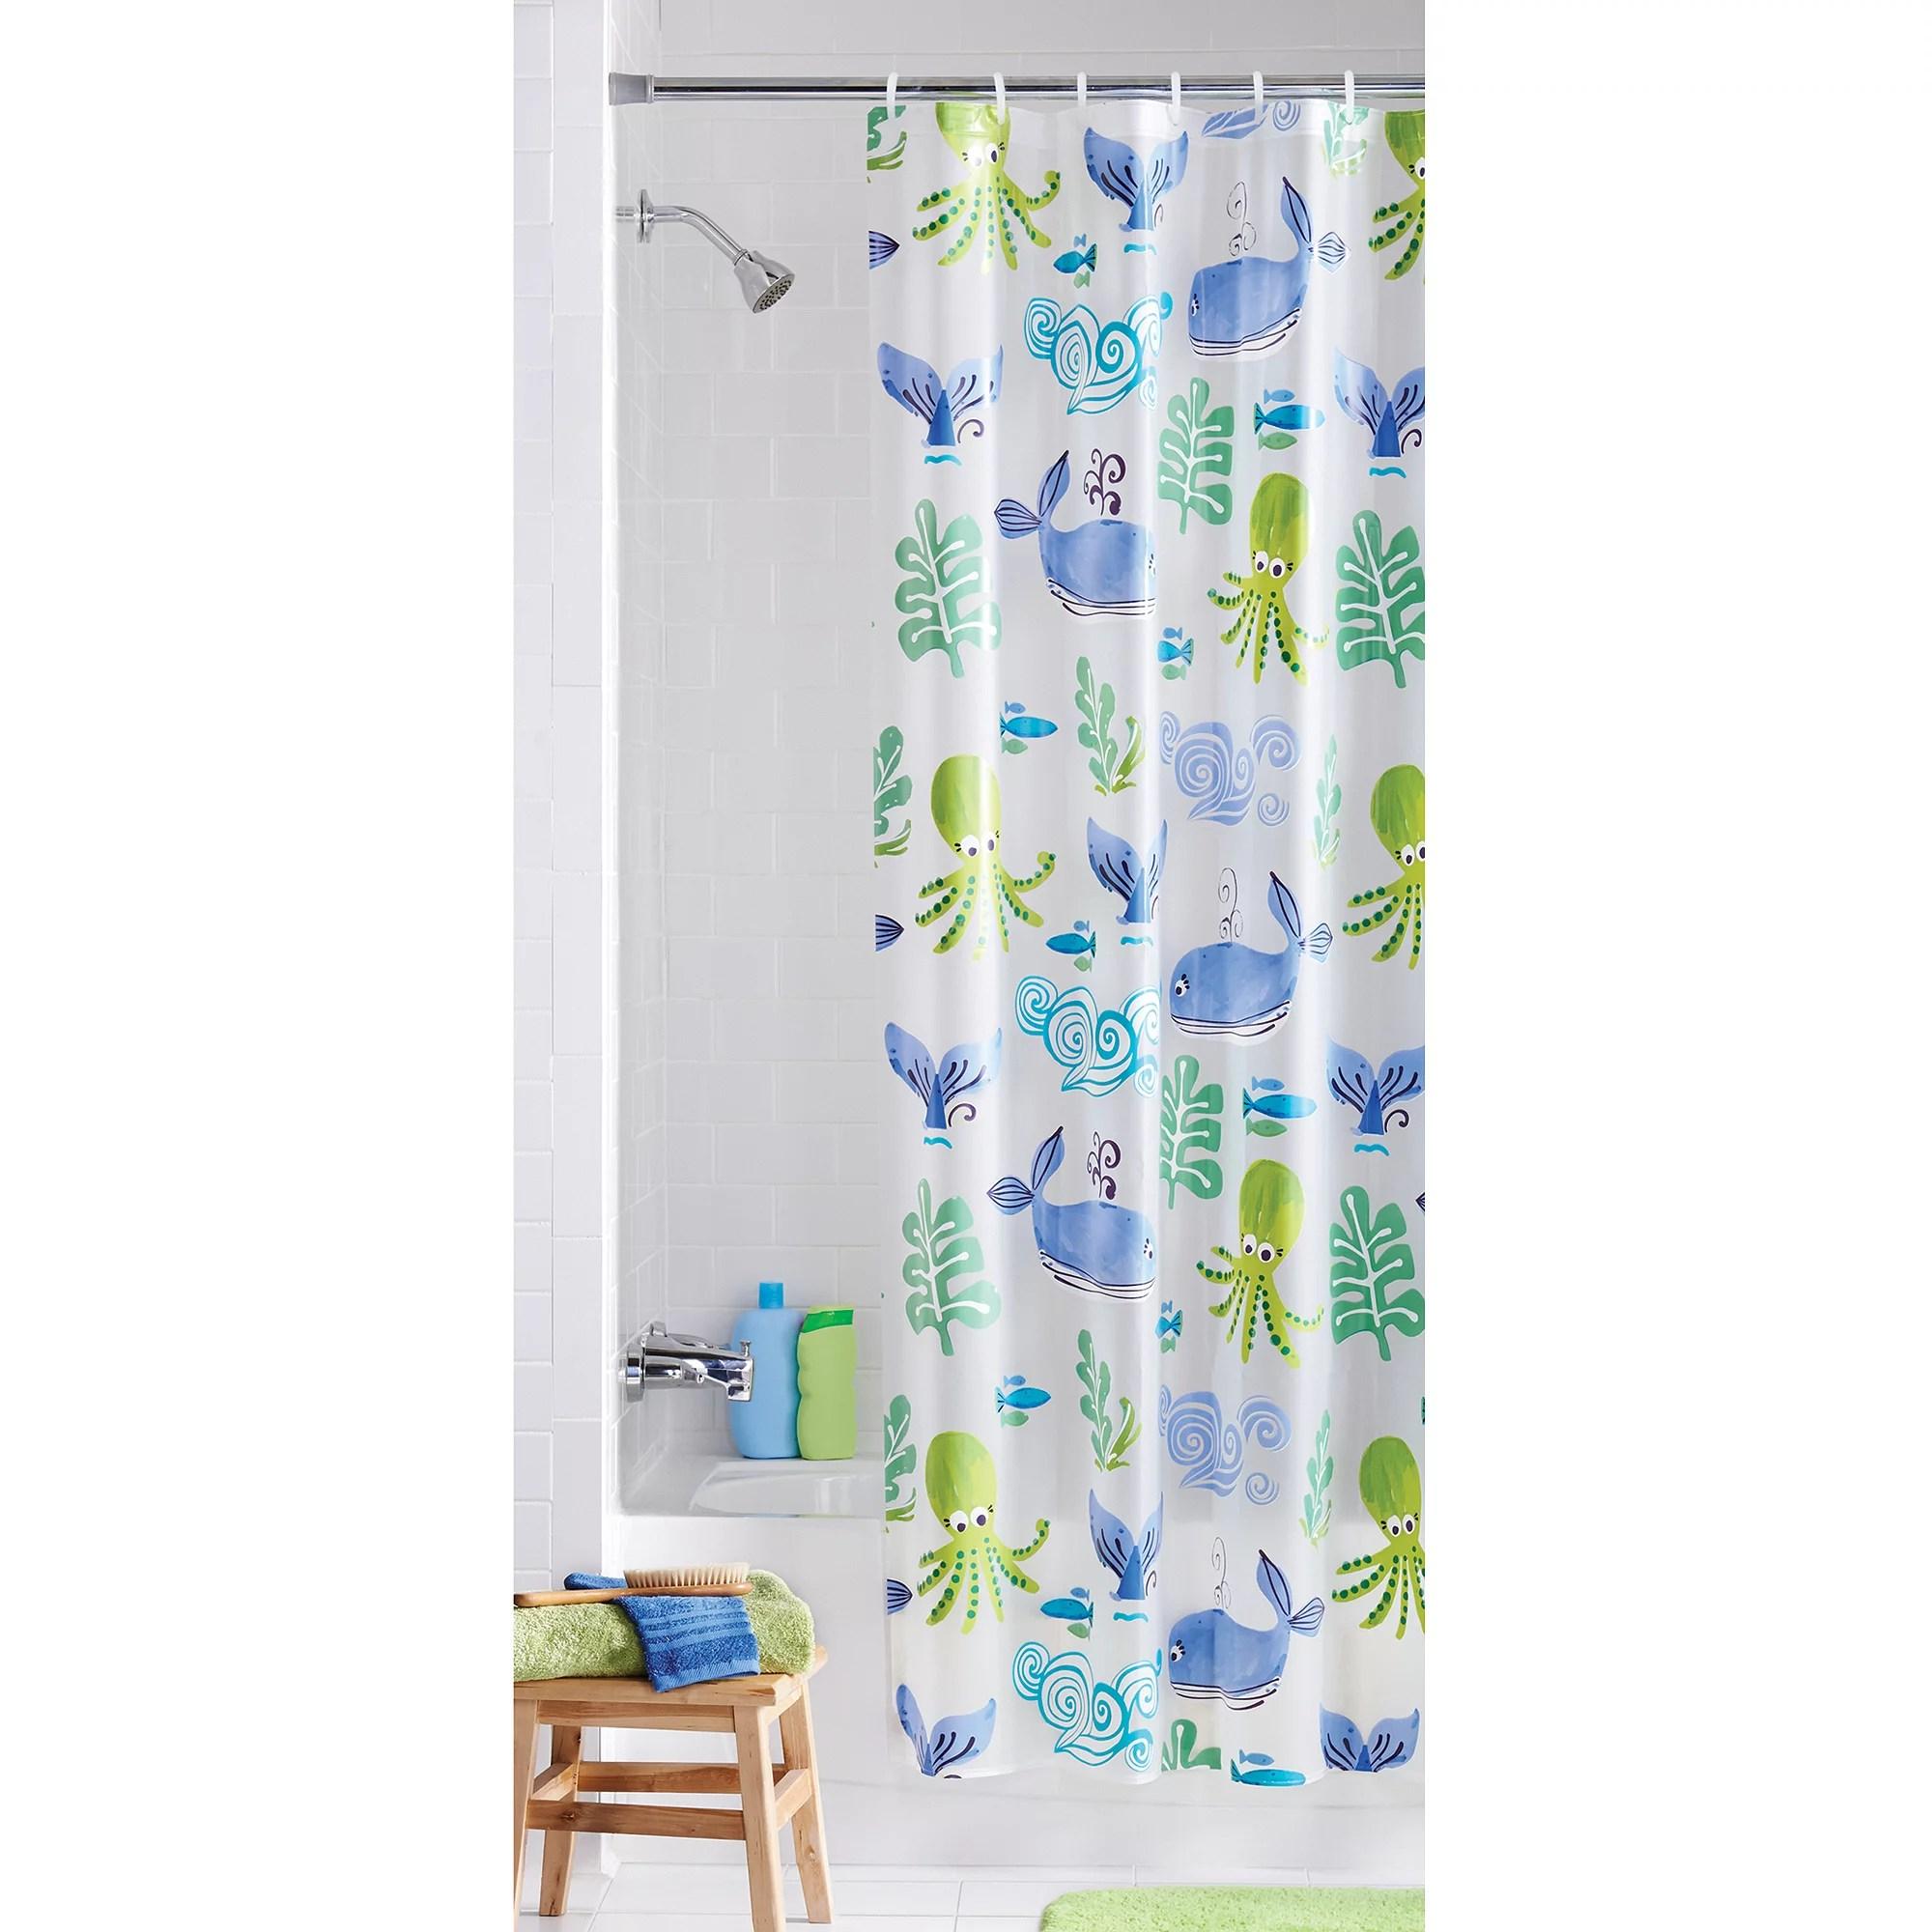 Mainstays Neptune PEVA Vinyl Shower Curtain  Walmartcom